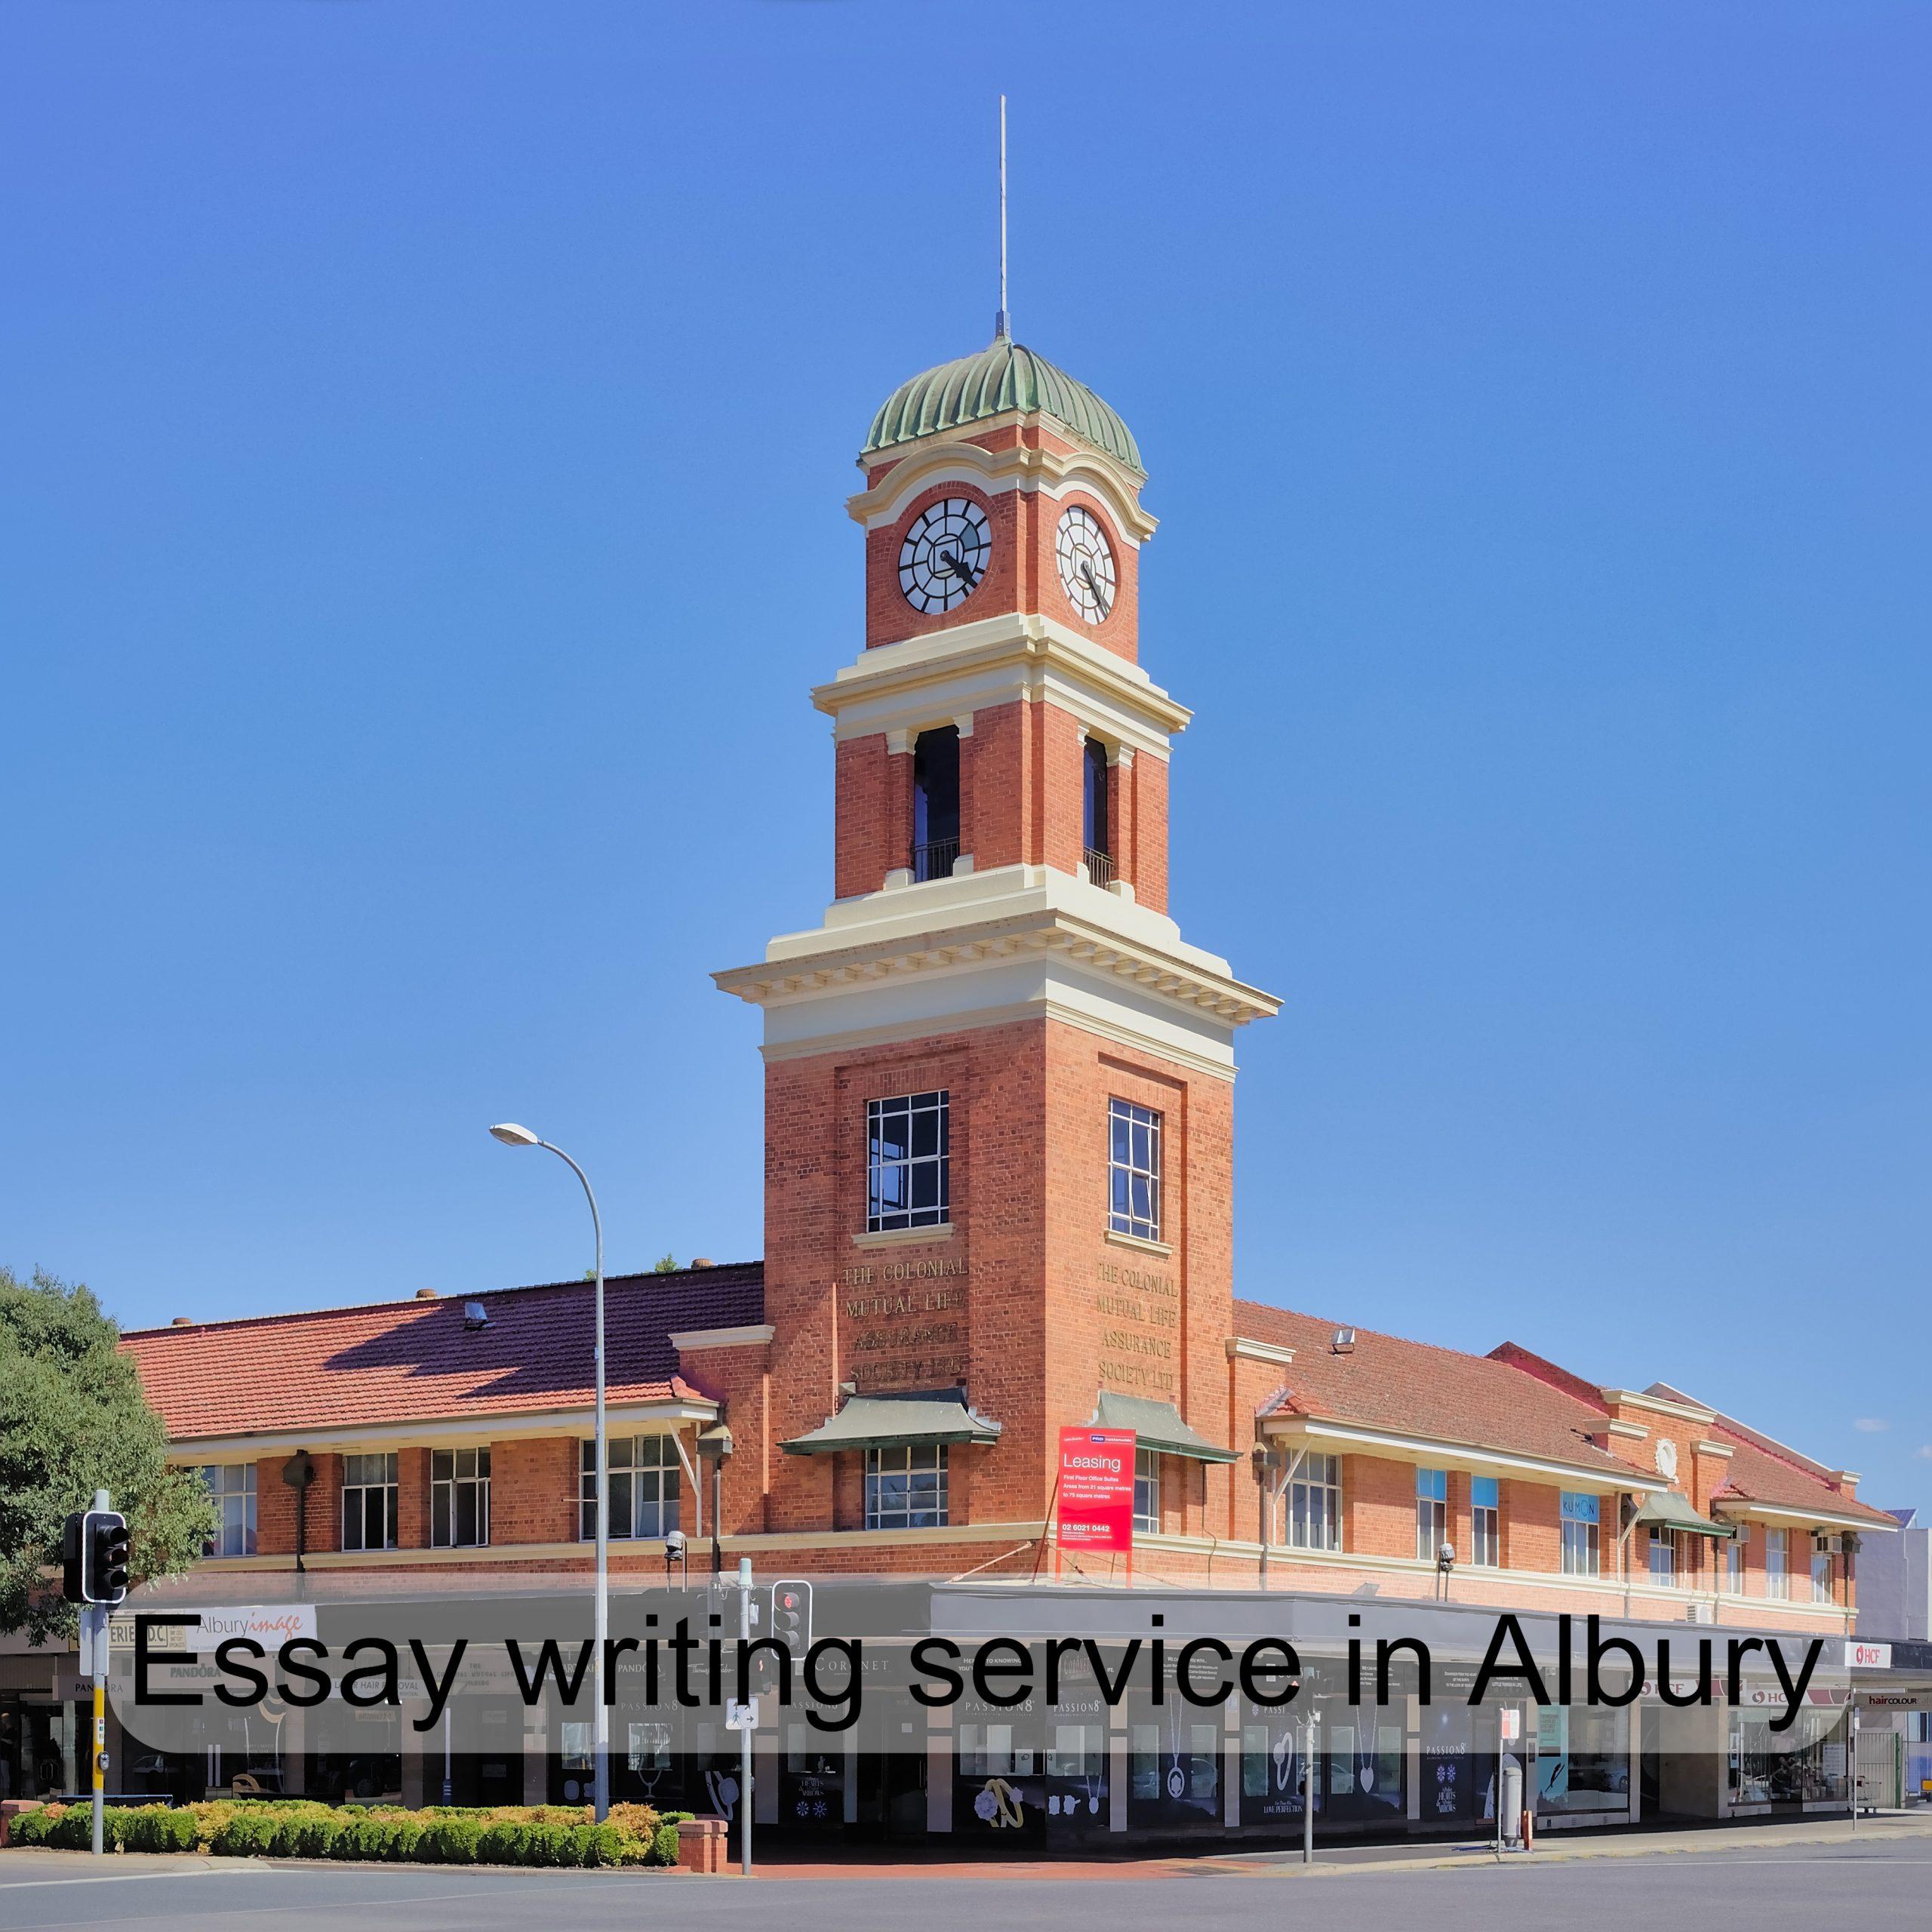 Essay writing service in Albury